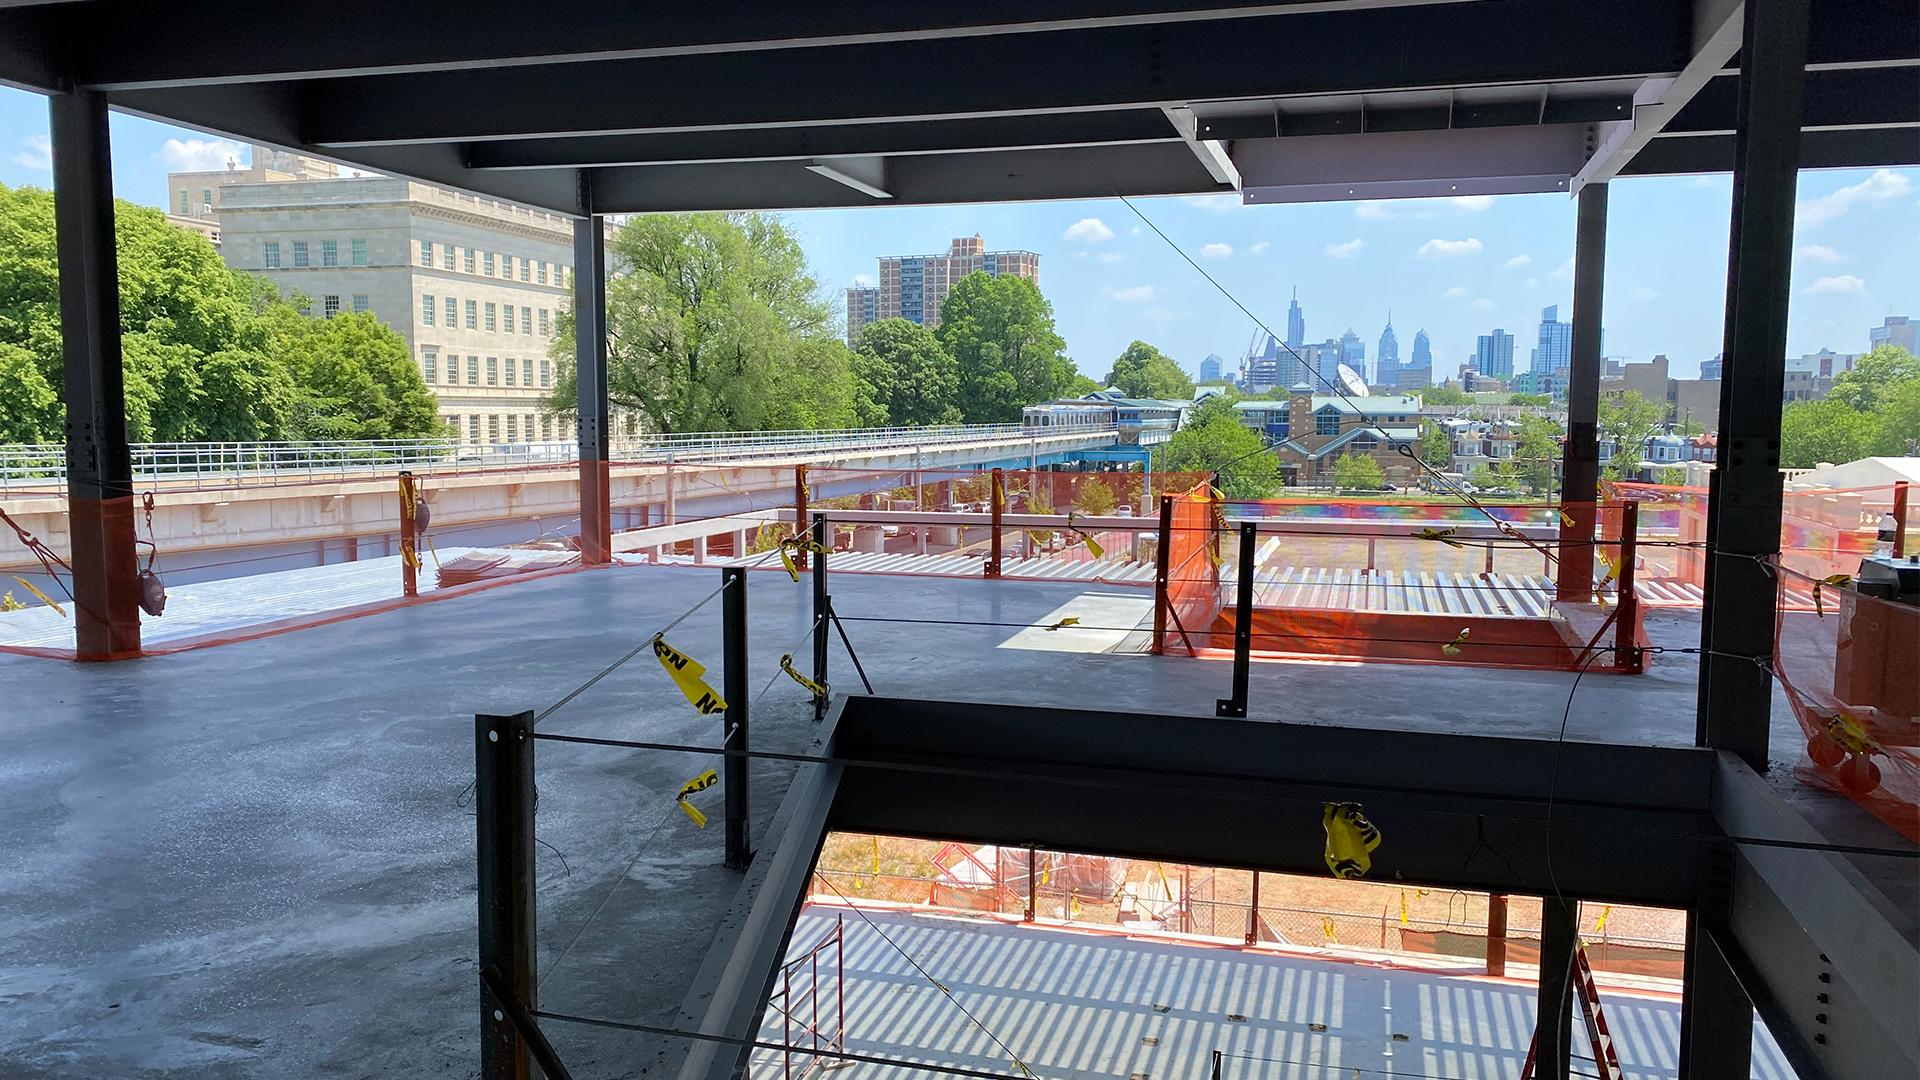 2-CCP-CATC_SCHRADERGROUP_May-Construction-Progress